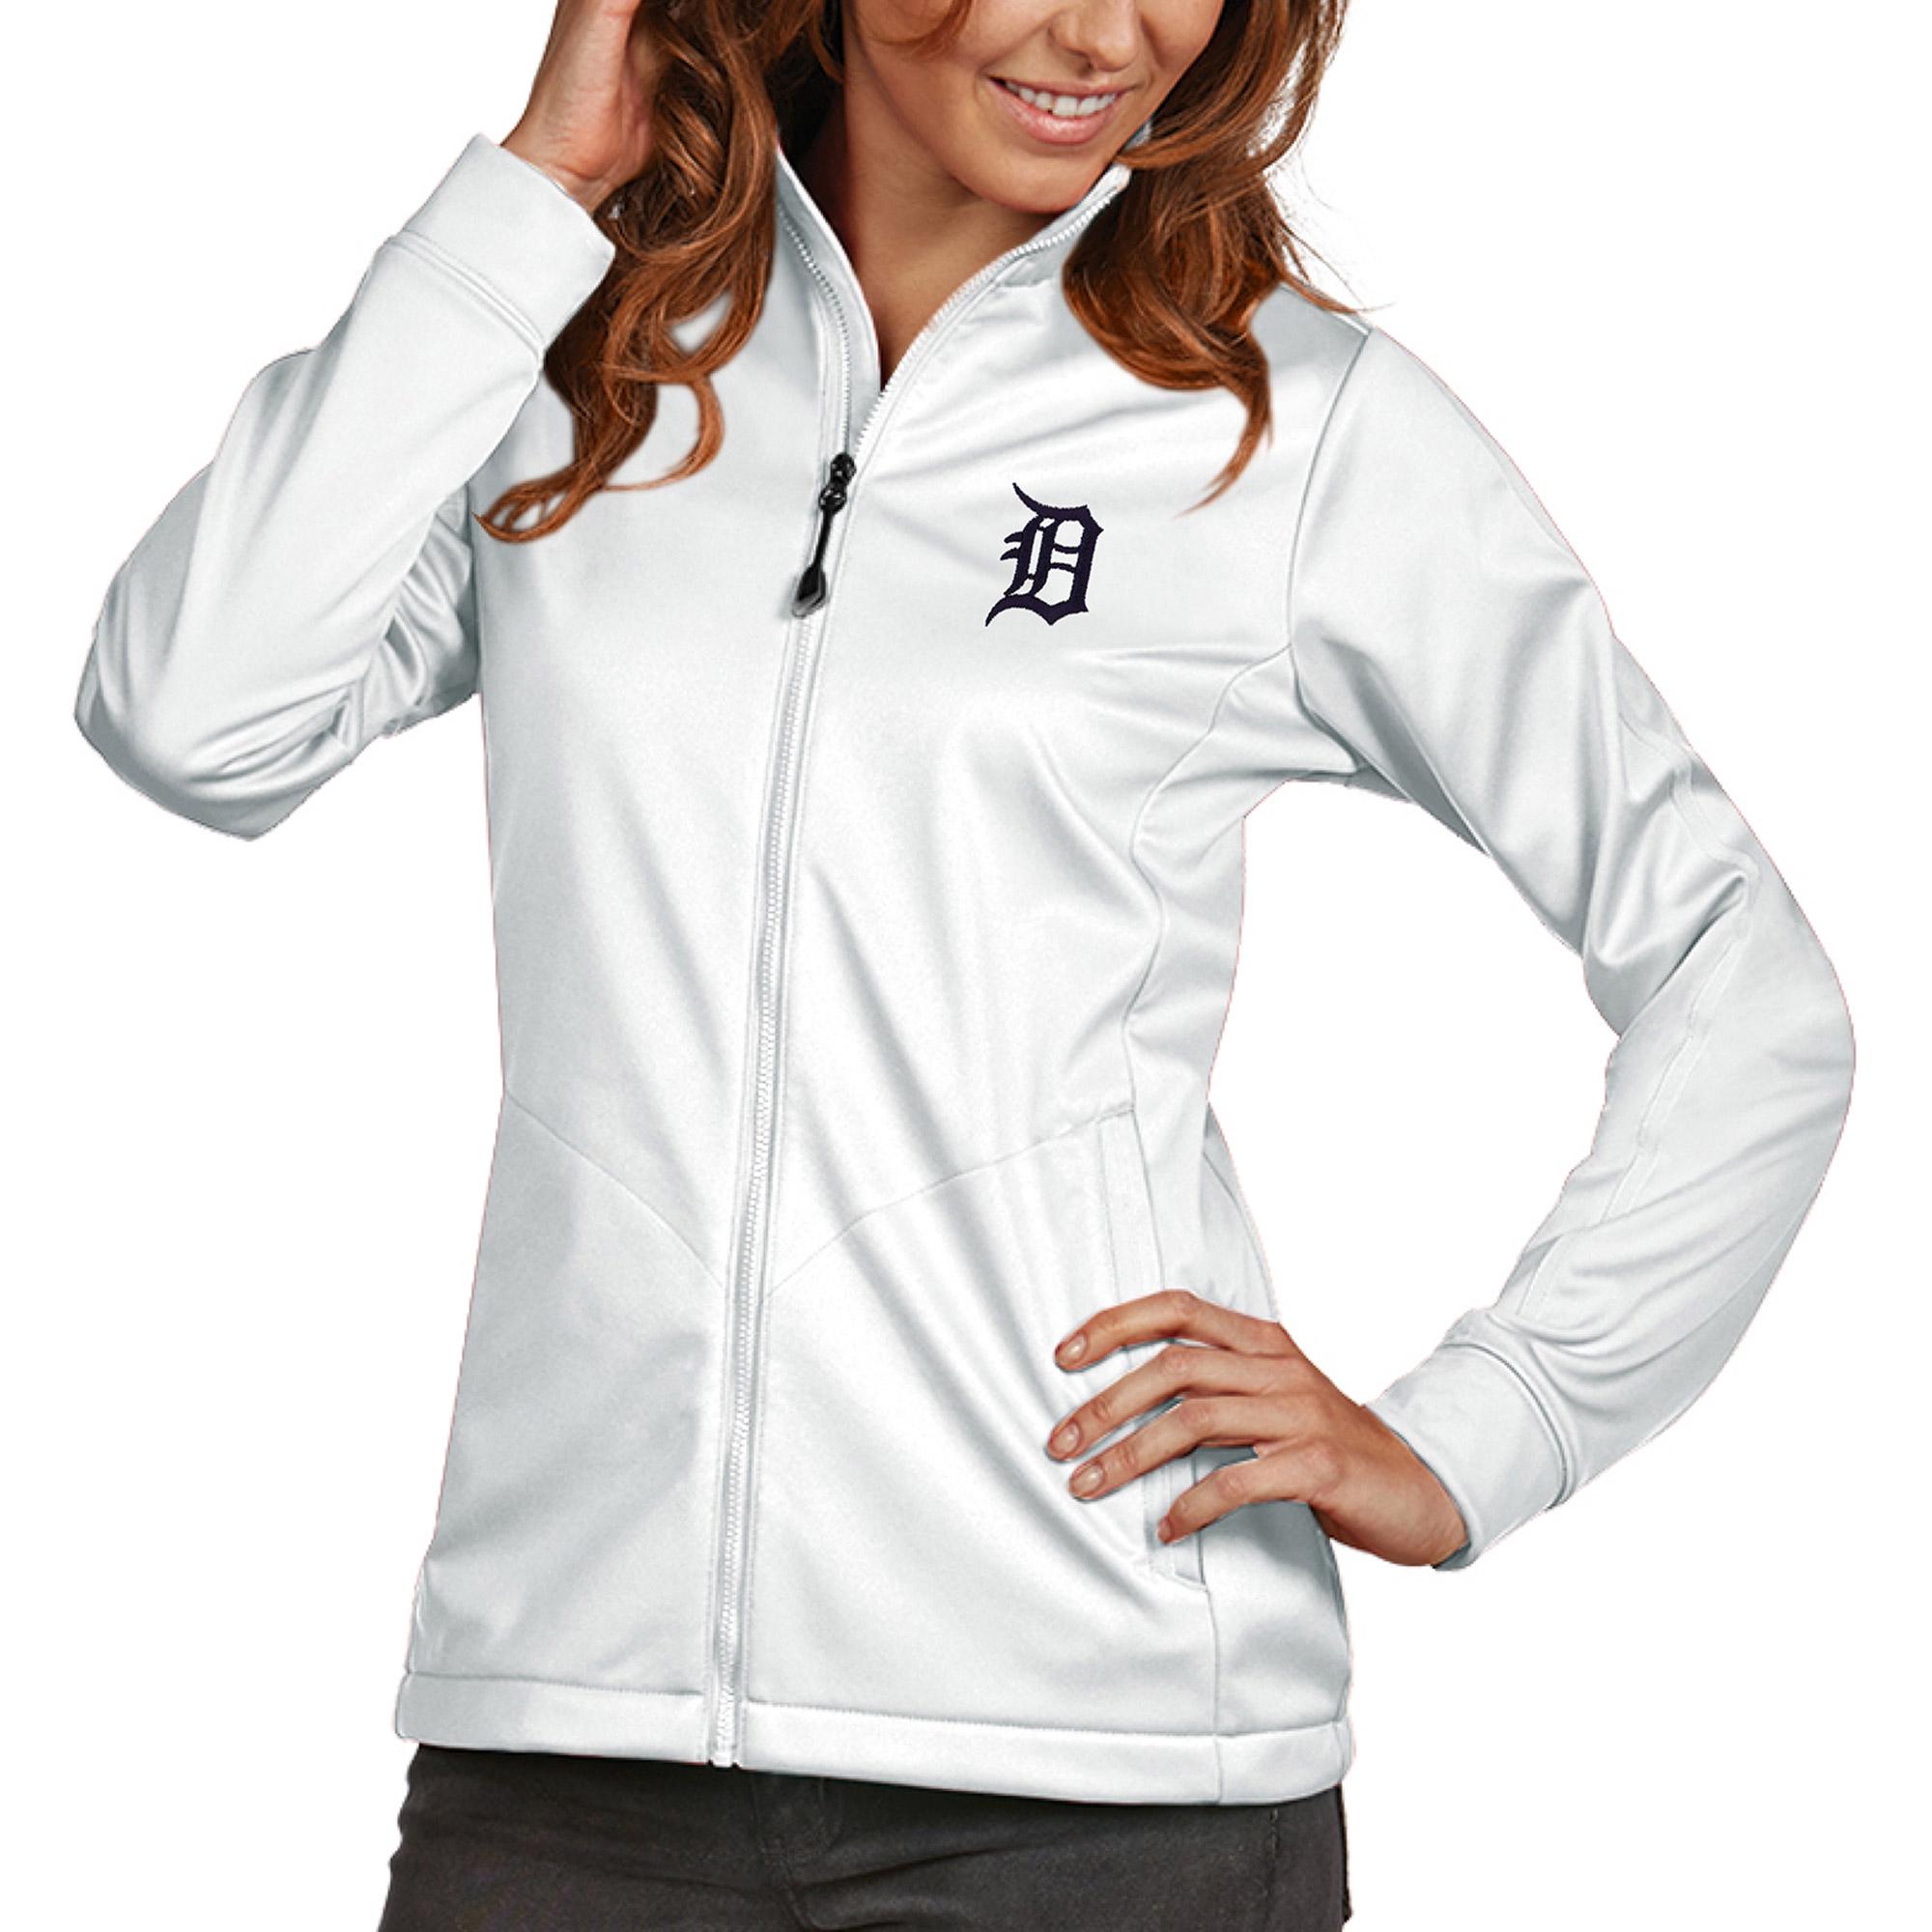 Detroit Tigers Antigua Women's Golf Full-Zip Jacket - White